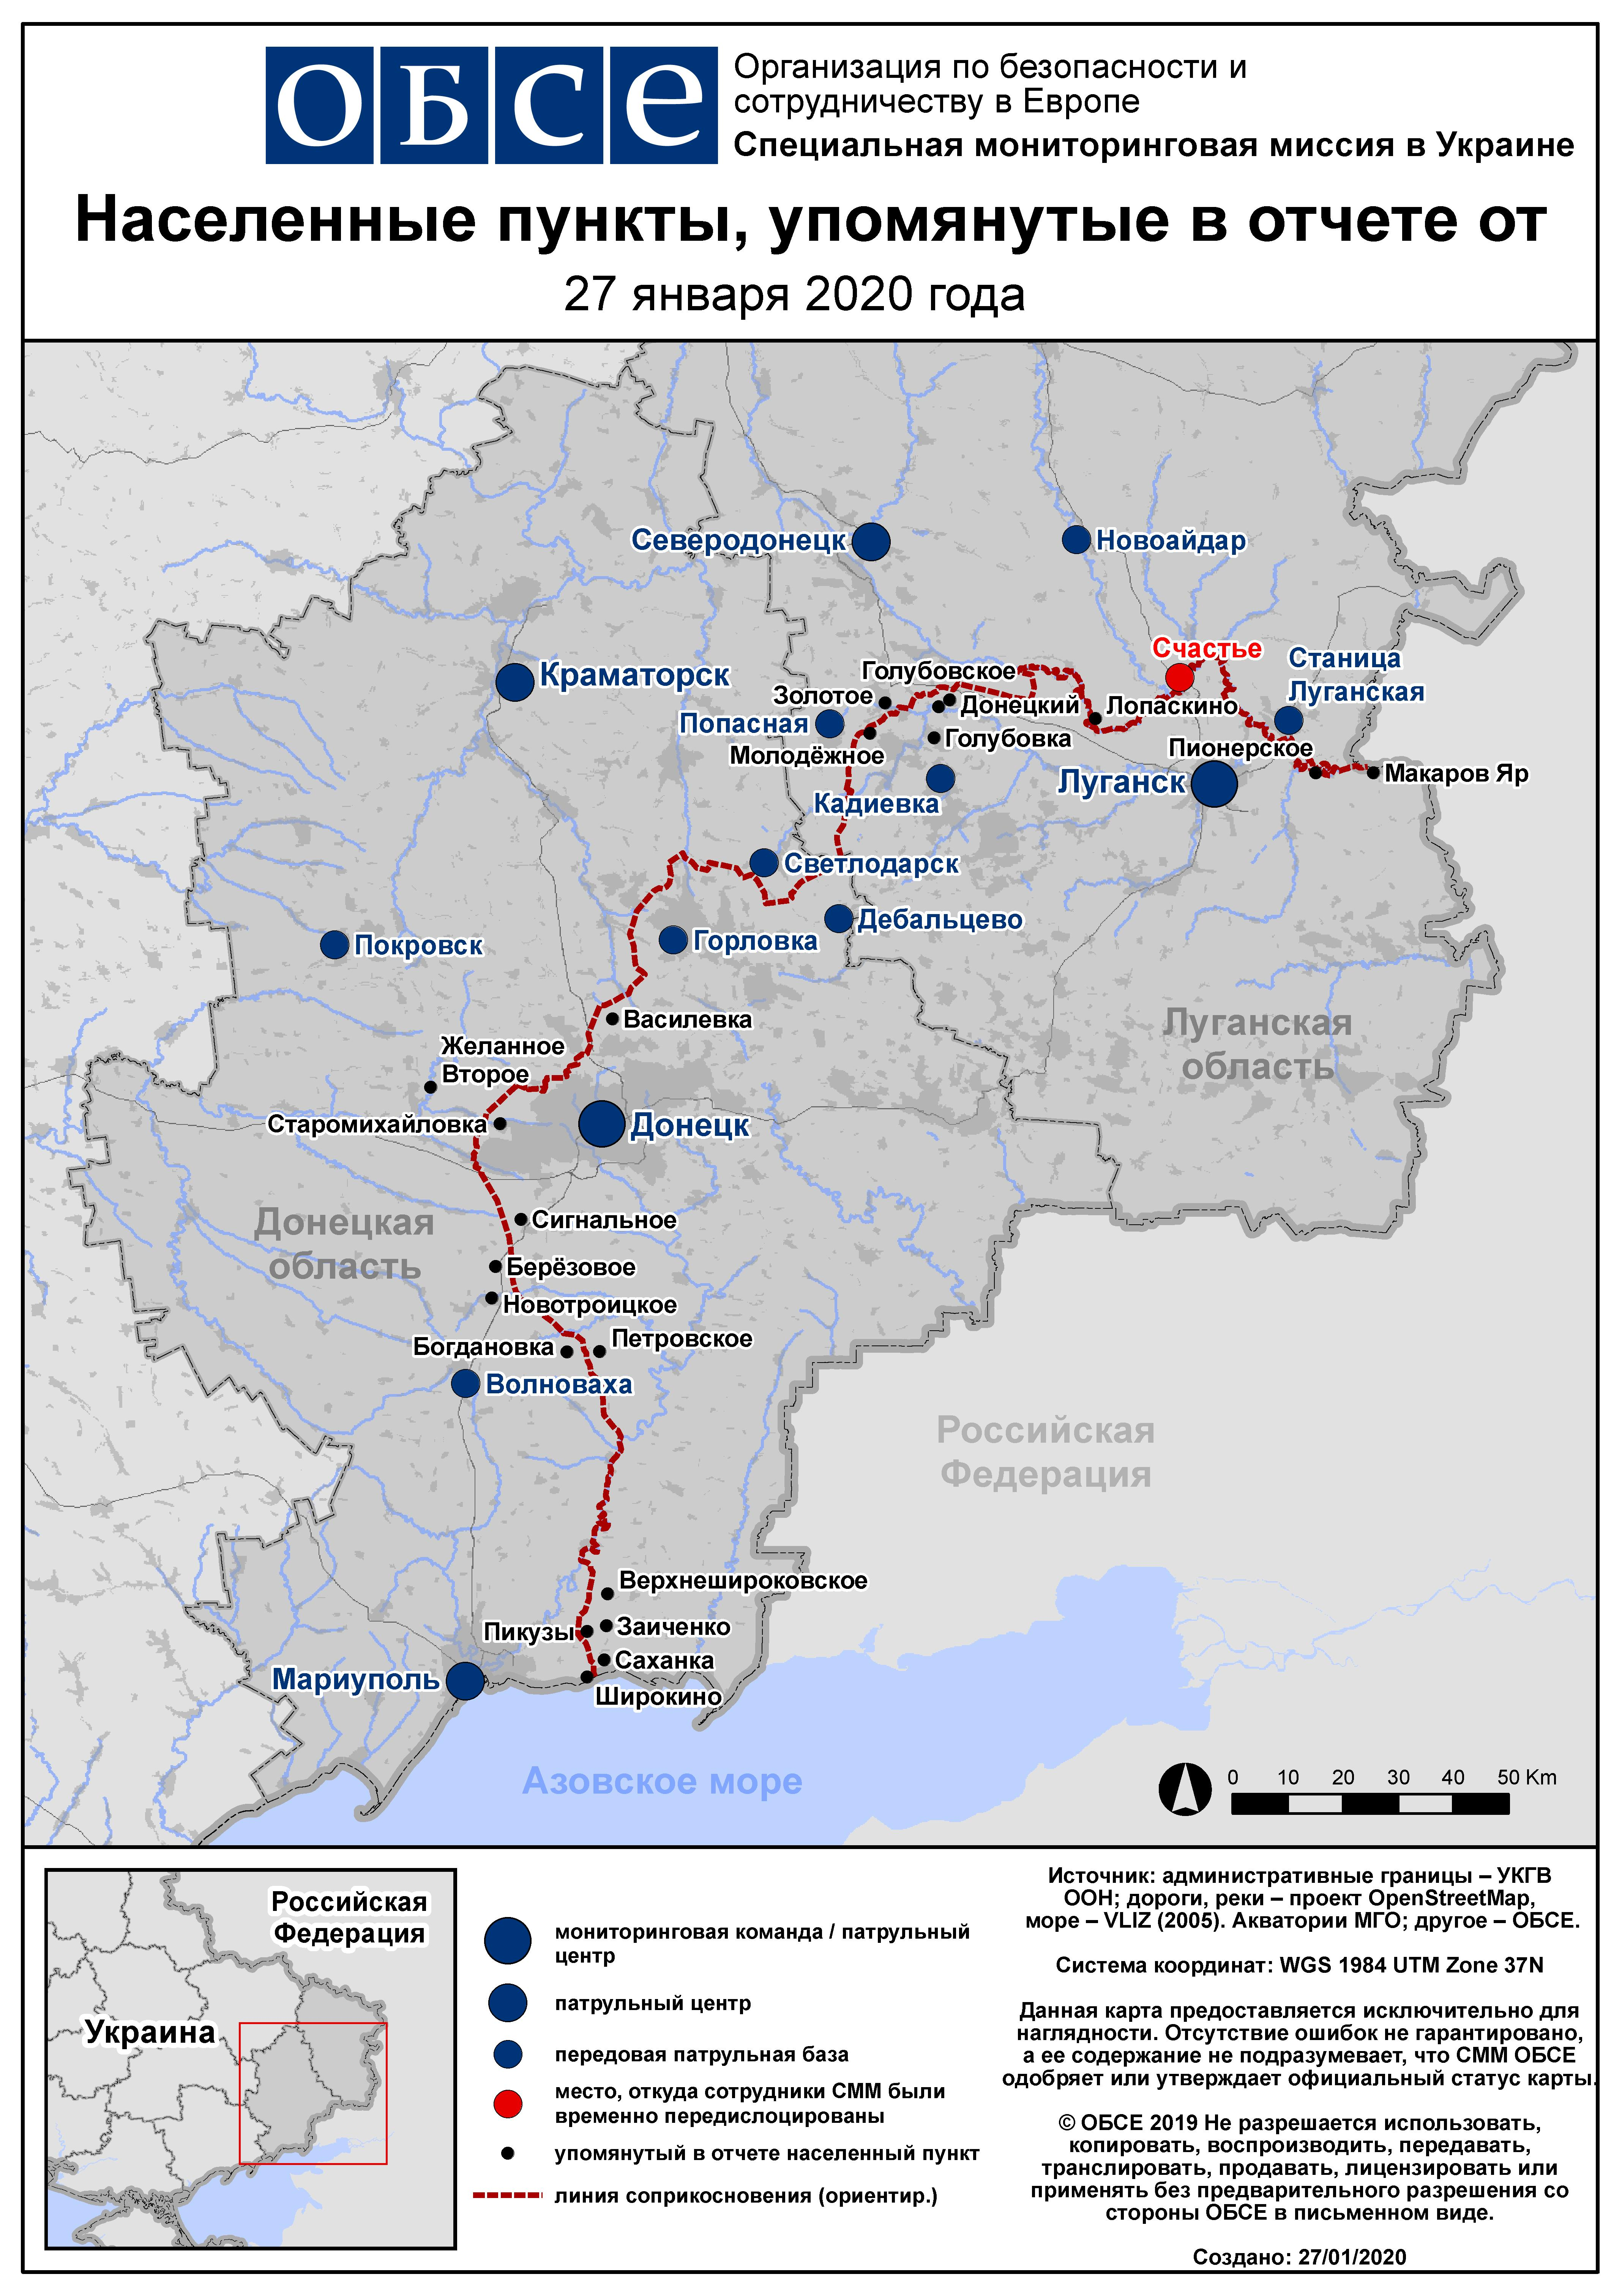 map_settlements--2020-01-26